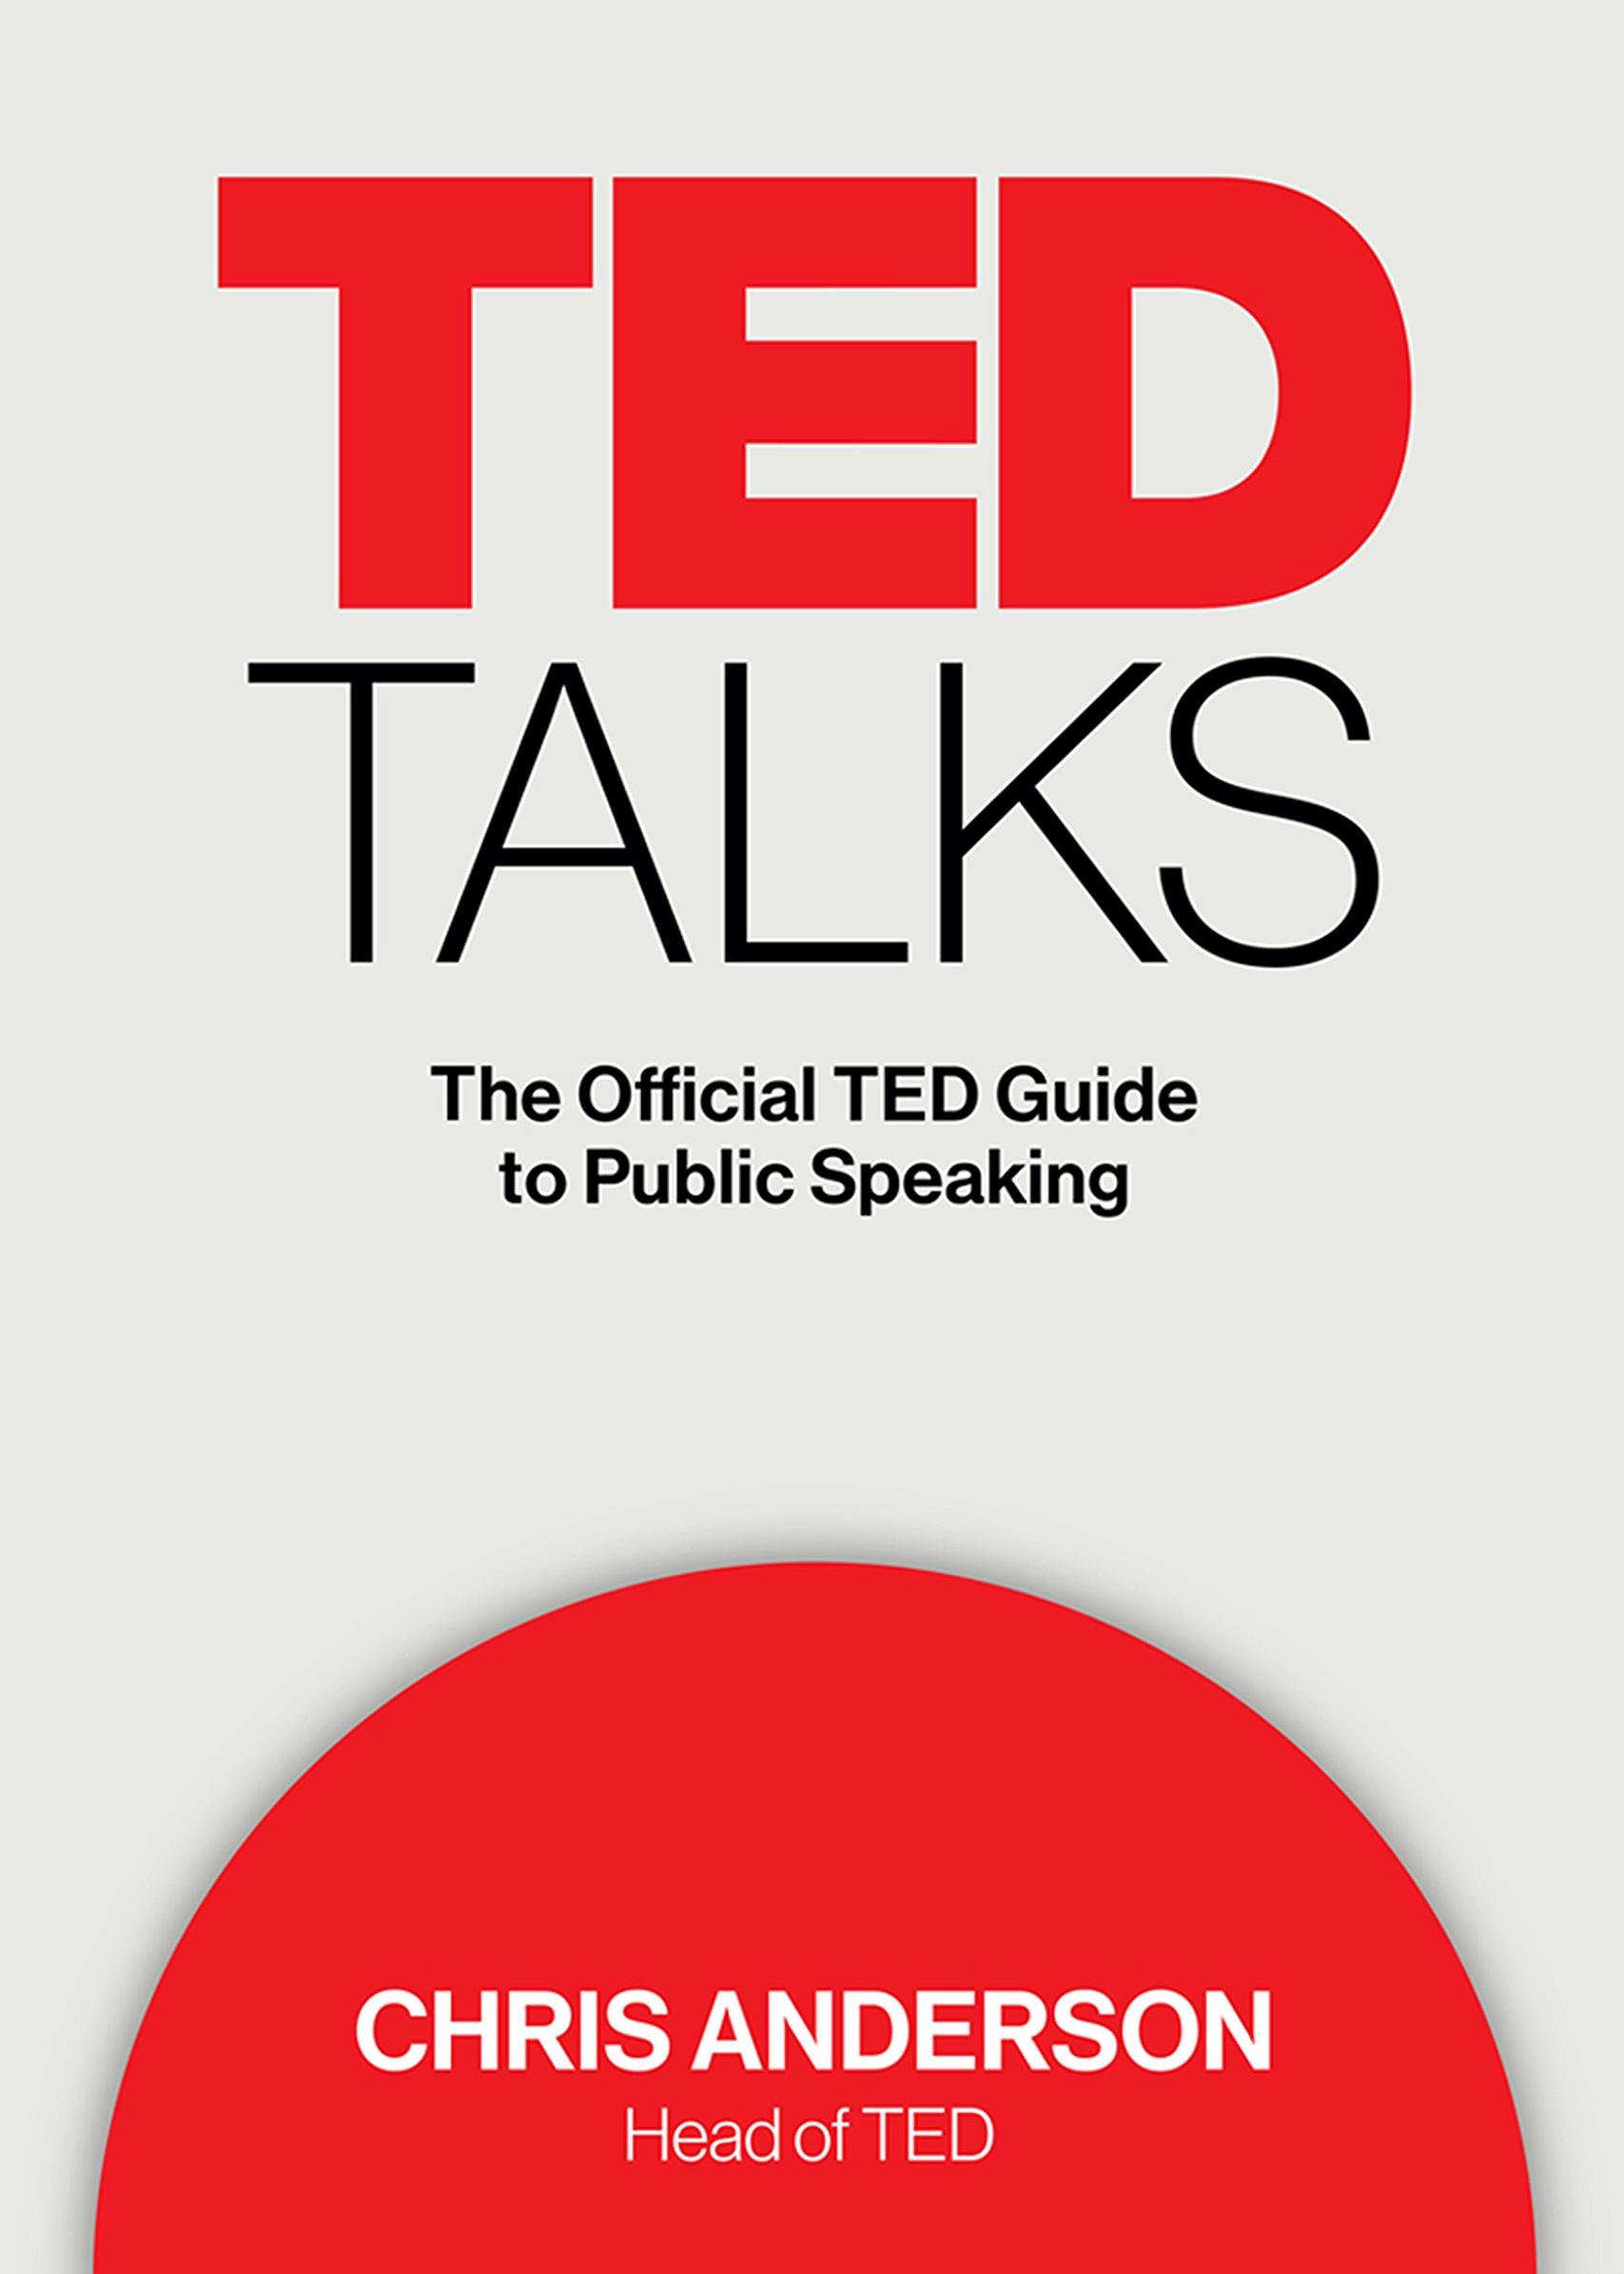 Anderson, Chris - Ted Talks.jpg